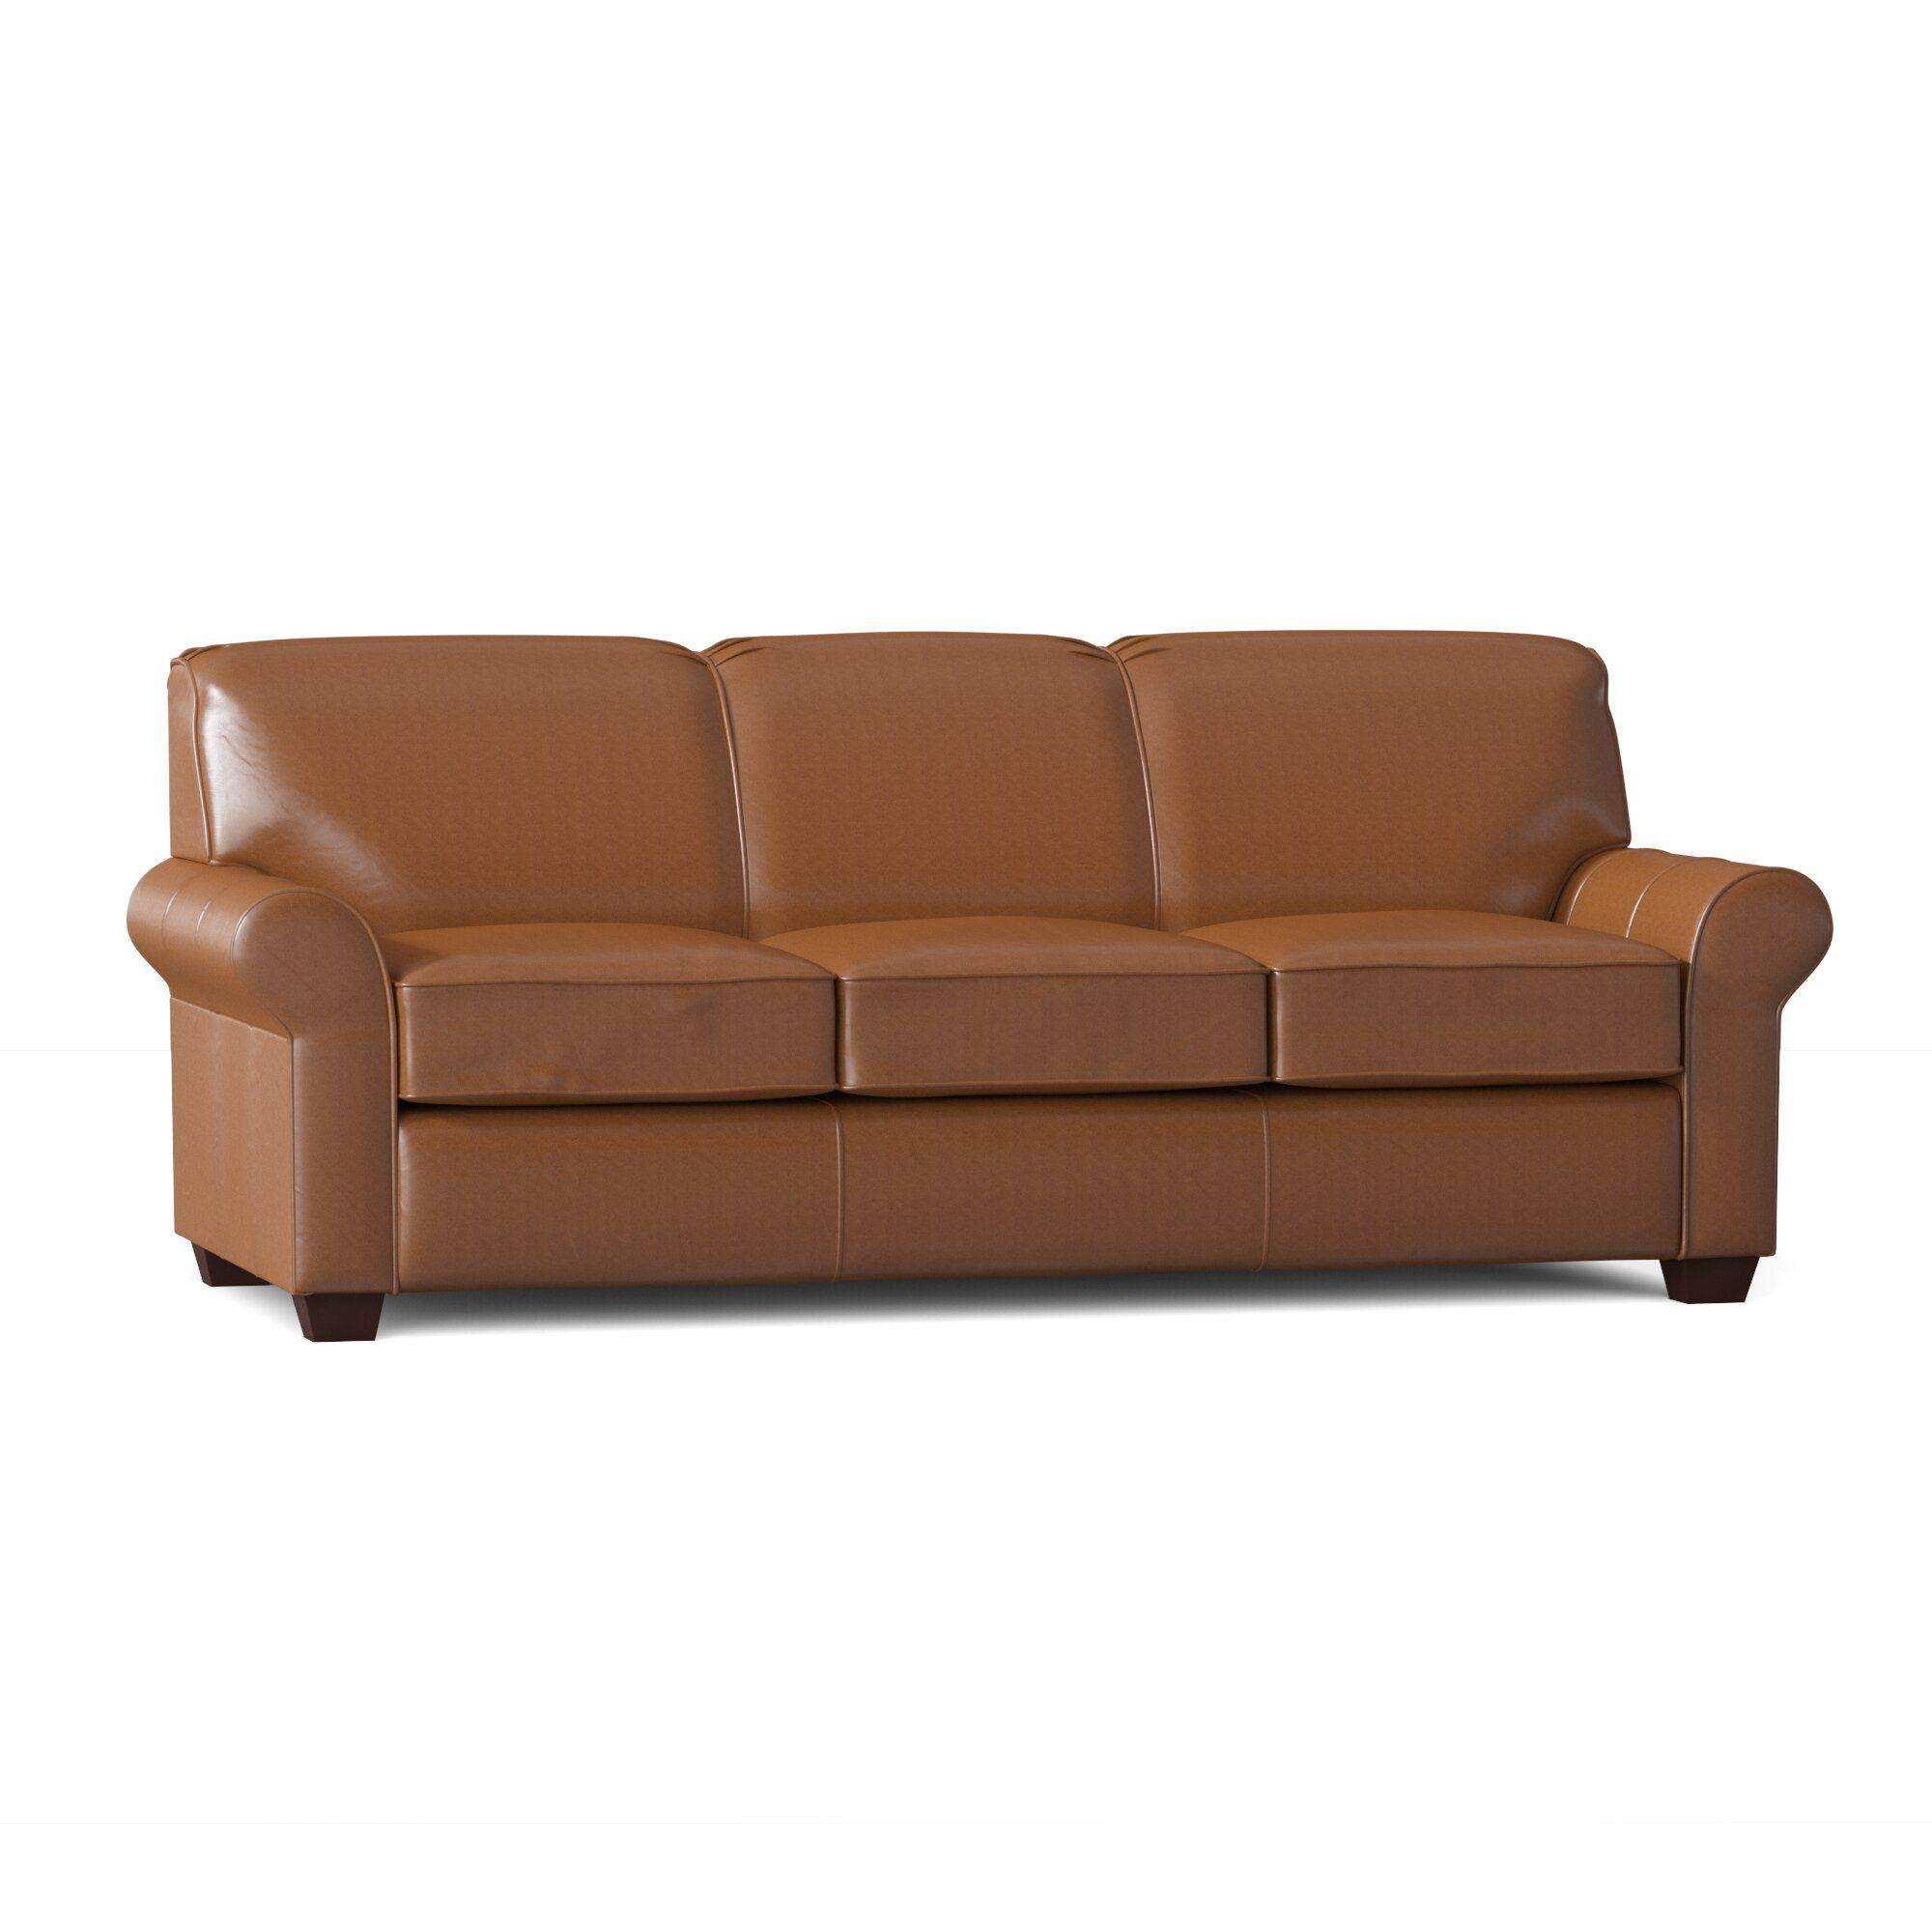 Birch Lane Beames Leather Sleeper Sofa